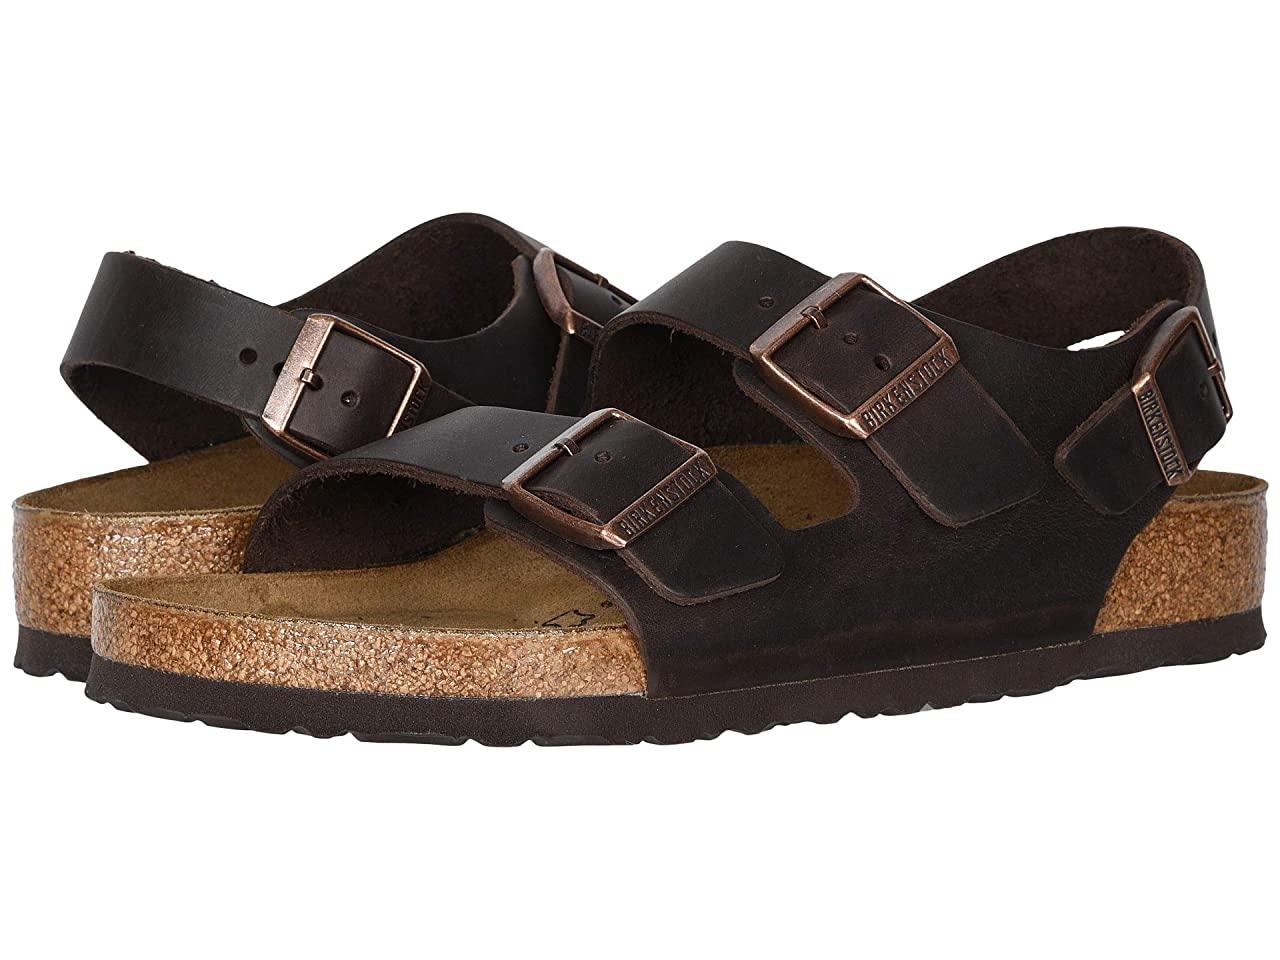 Сандали/Вьетнамки (Оригинал) Birkenstock Milano - Oiled Leather (Unisex) Habana Oiled Leather